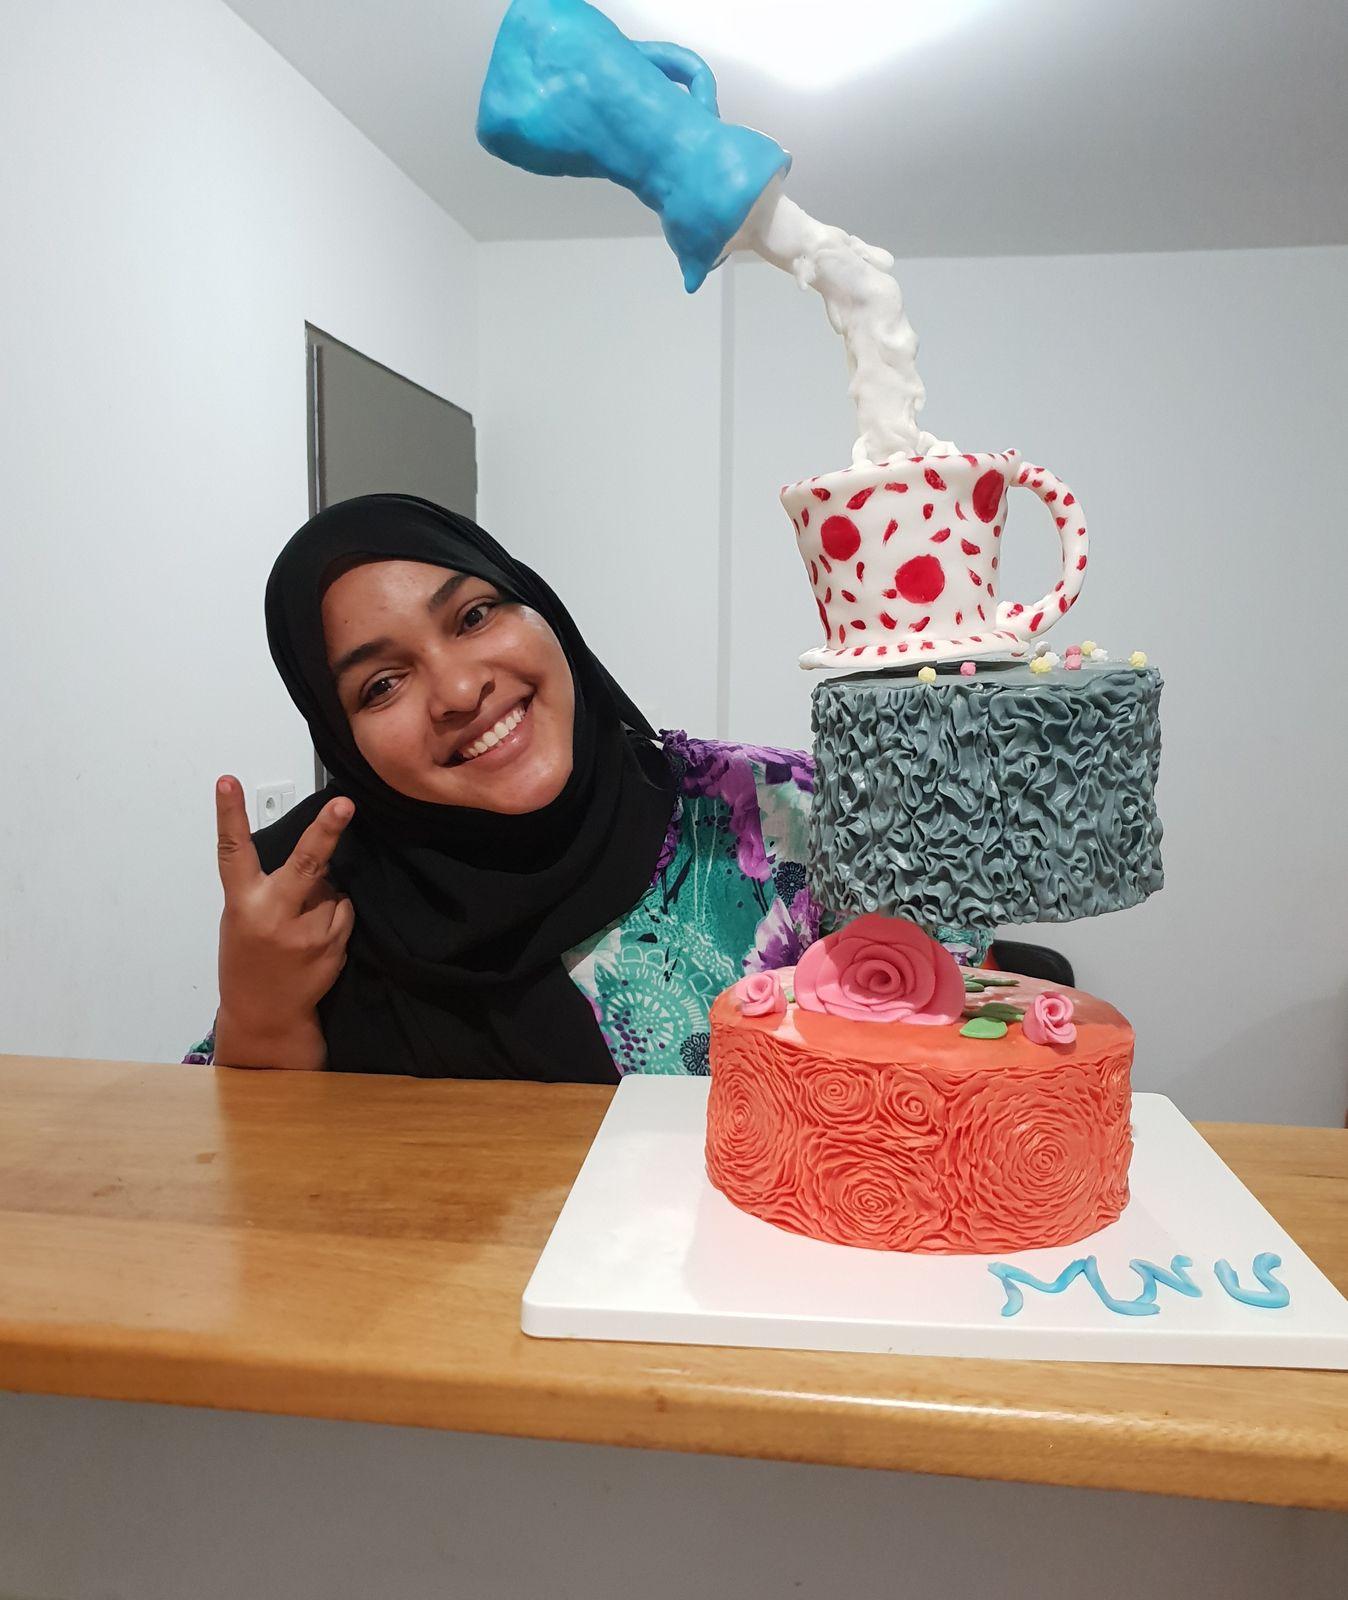 Defying gravity cake